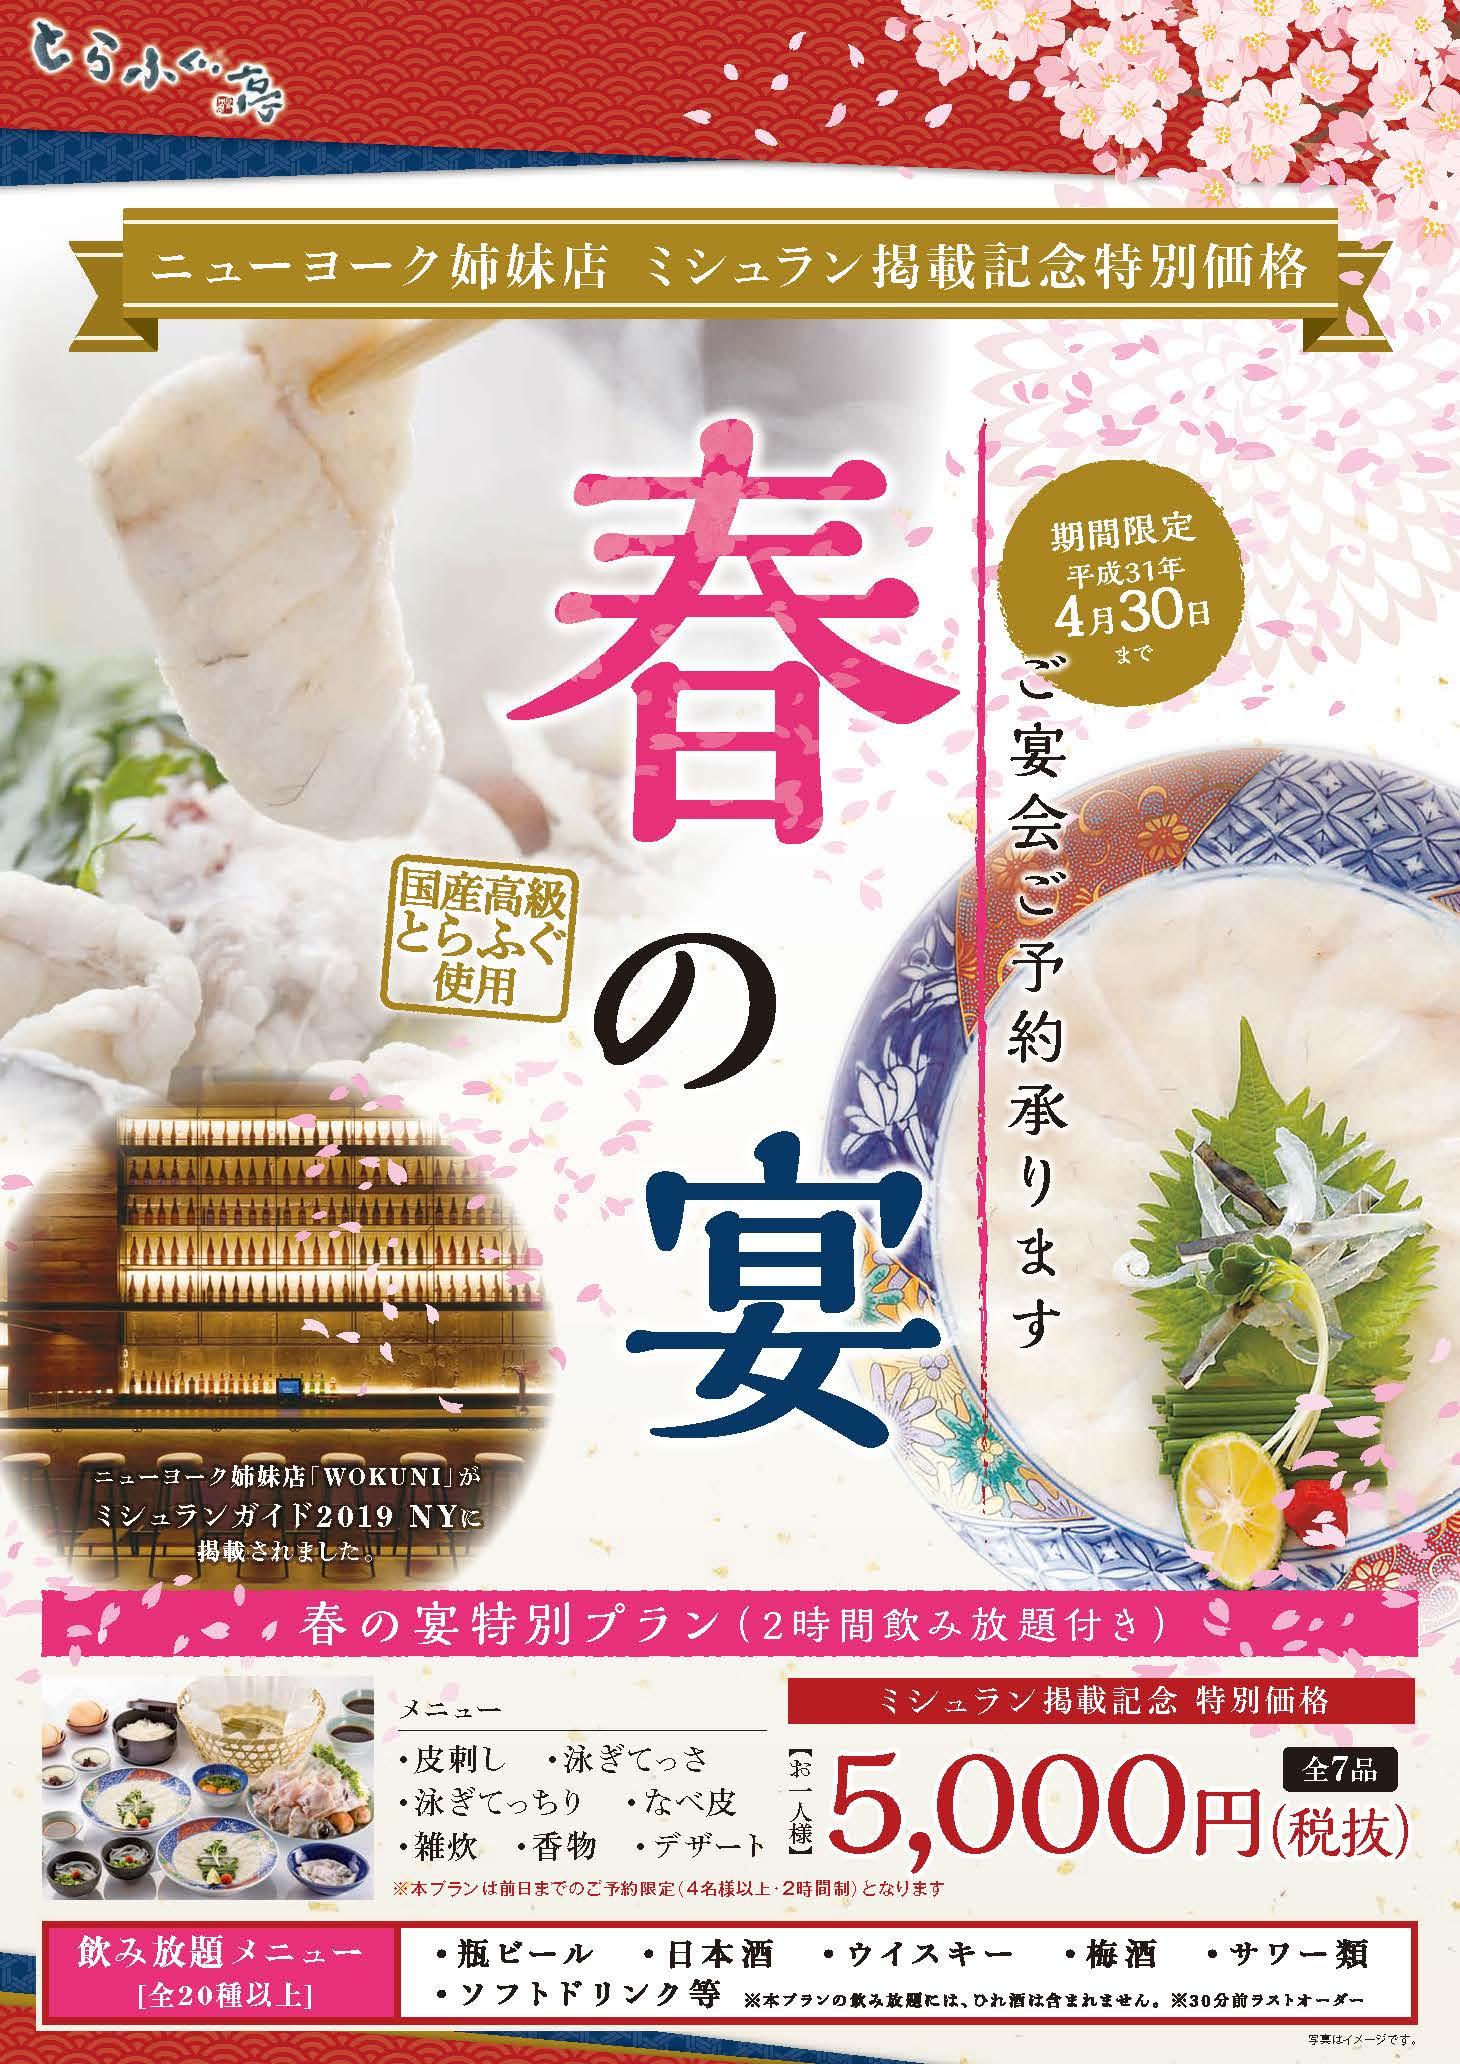 NY姉妹店ミシュラン掲載記念 春の歓送迎会特別コース ポスター